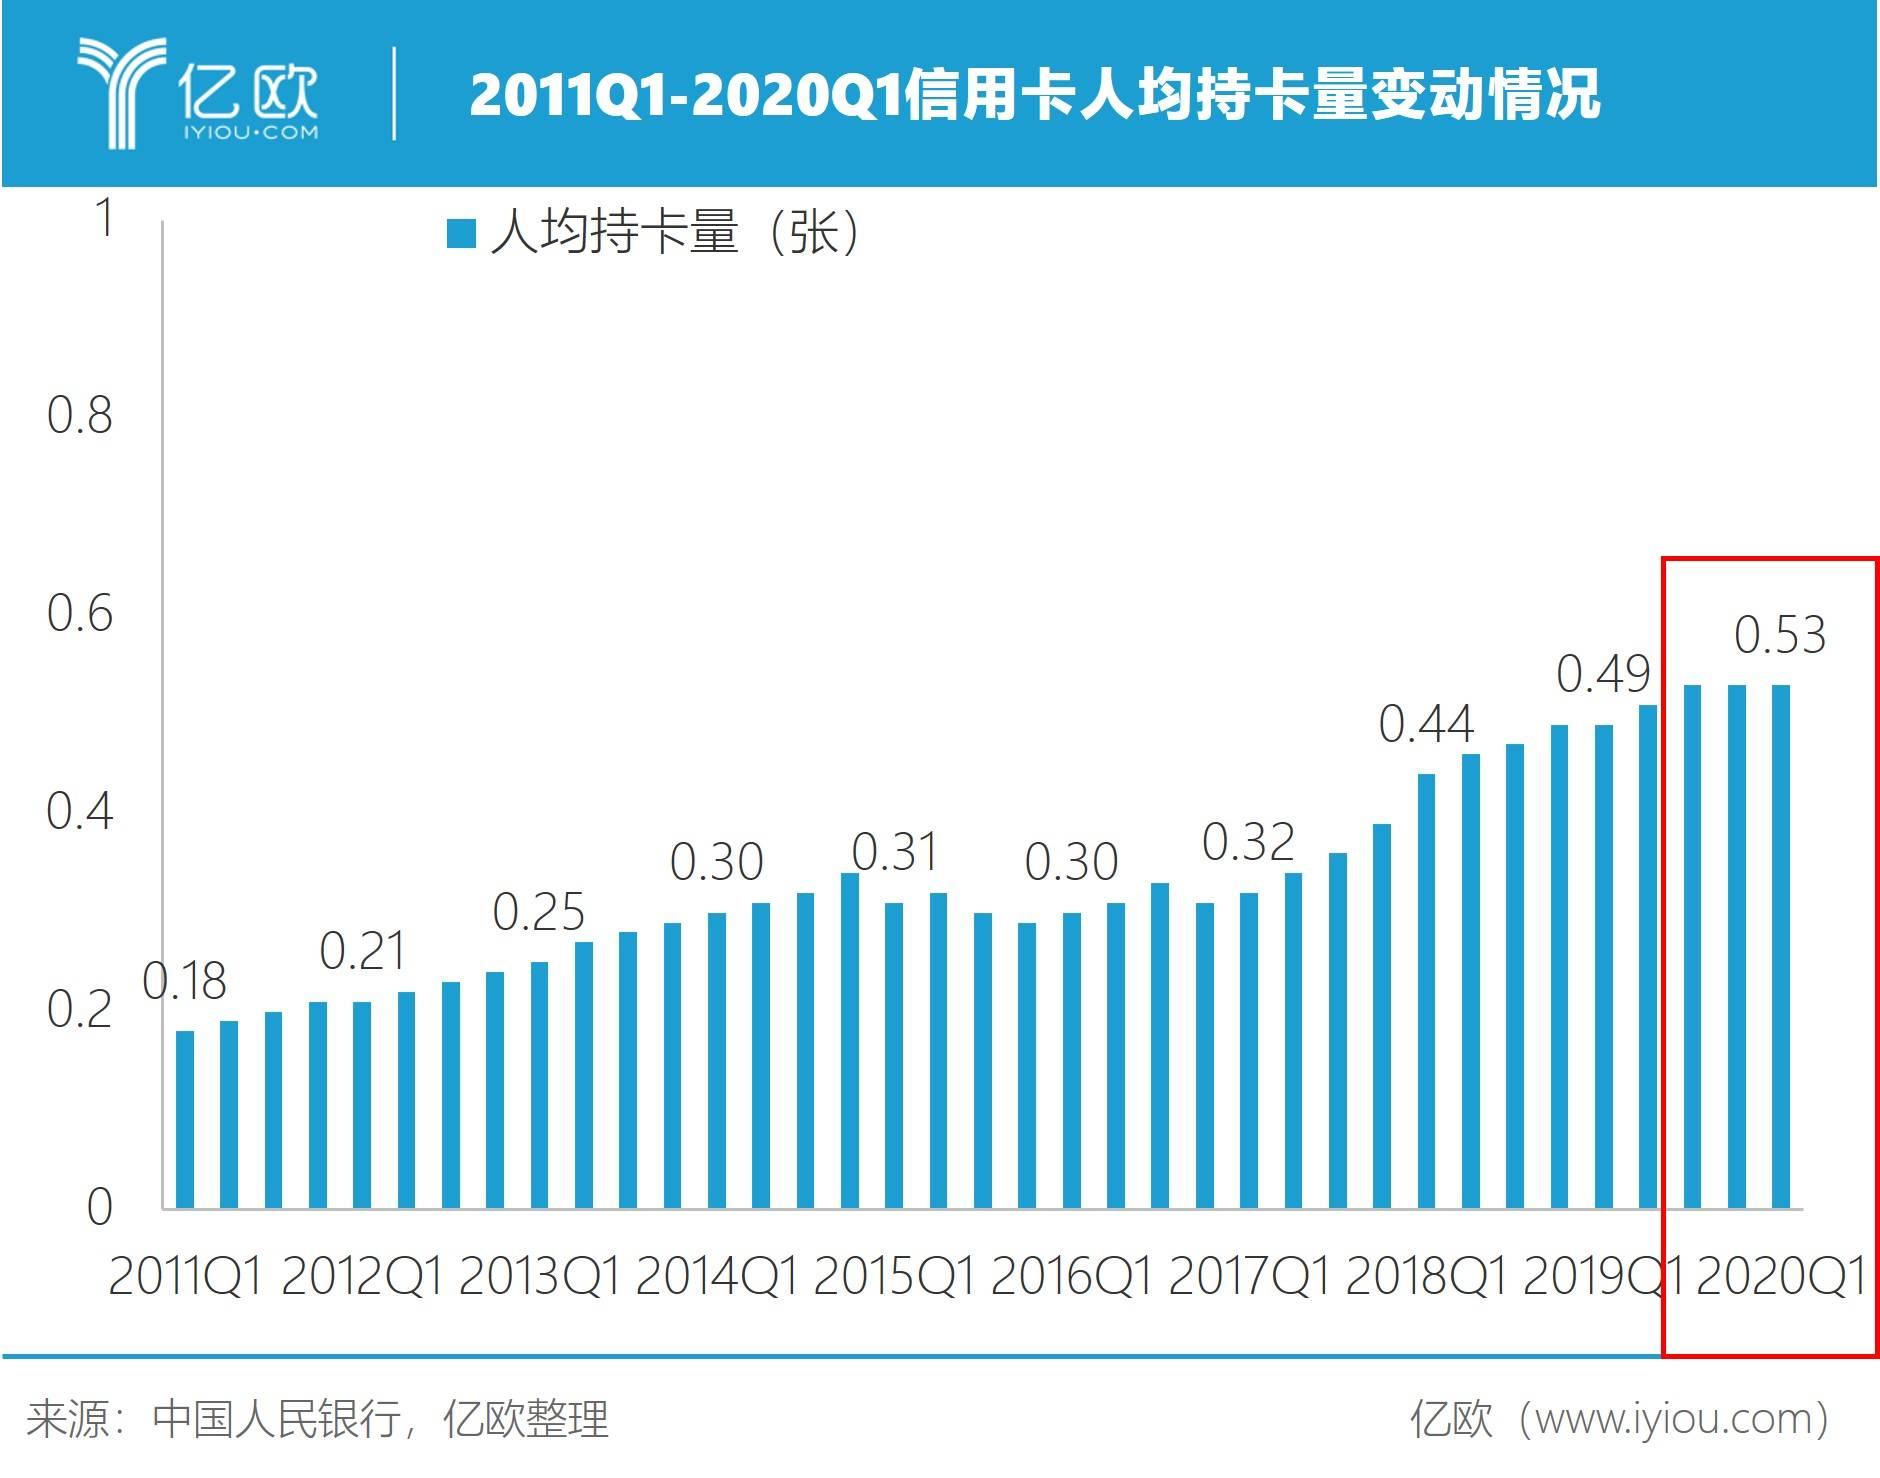 2011Q1-2020Q1名誉卡人均持卡量转折情况